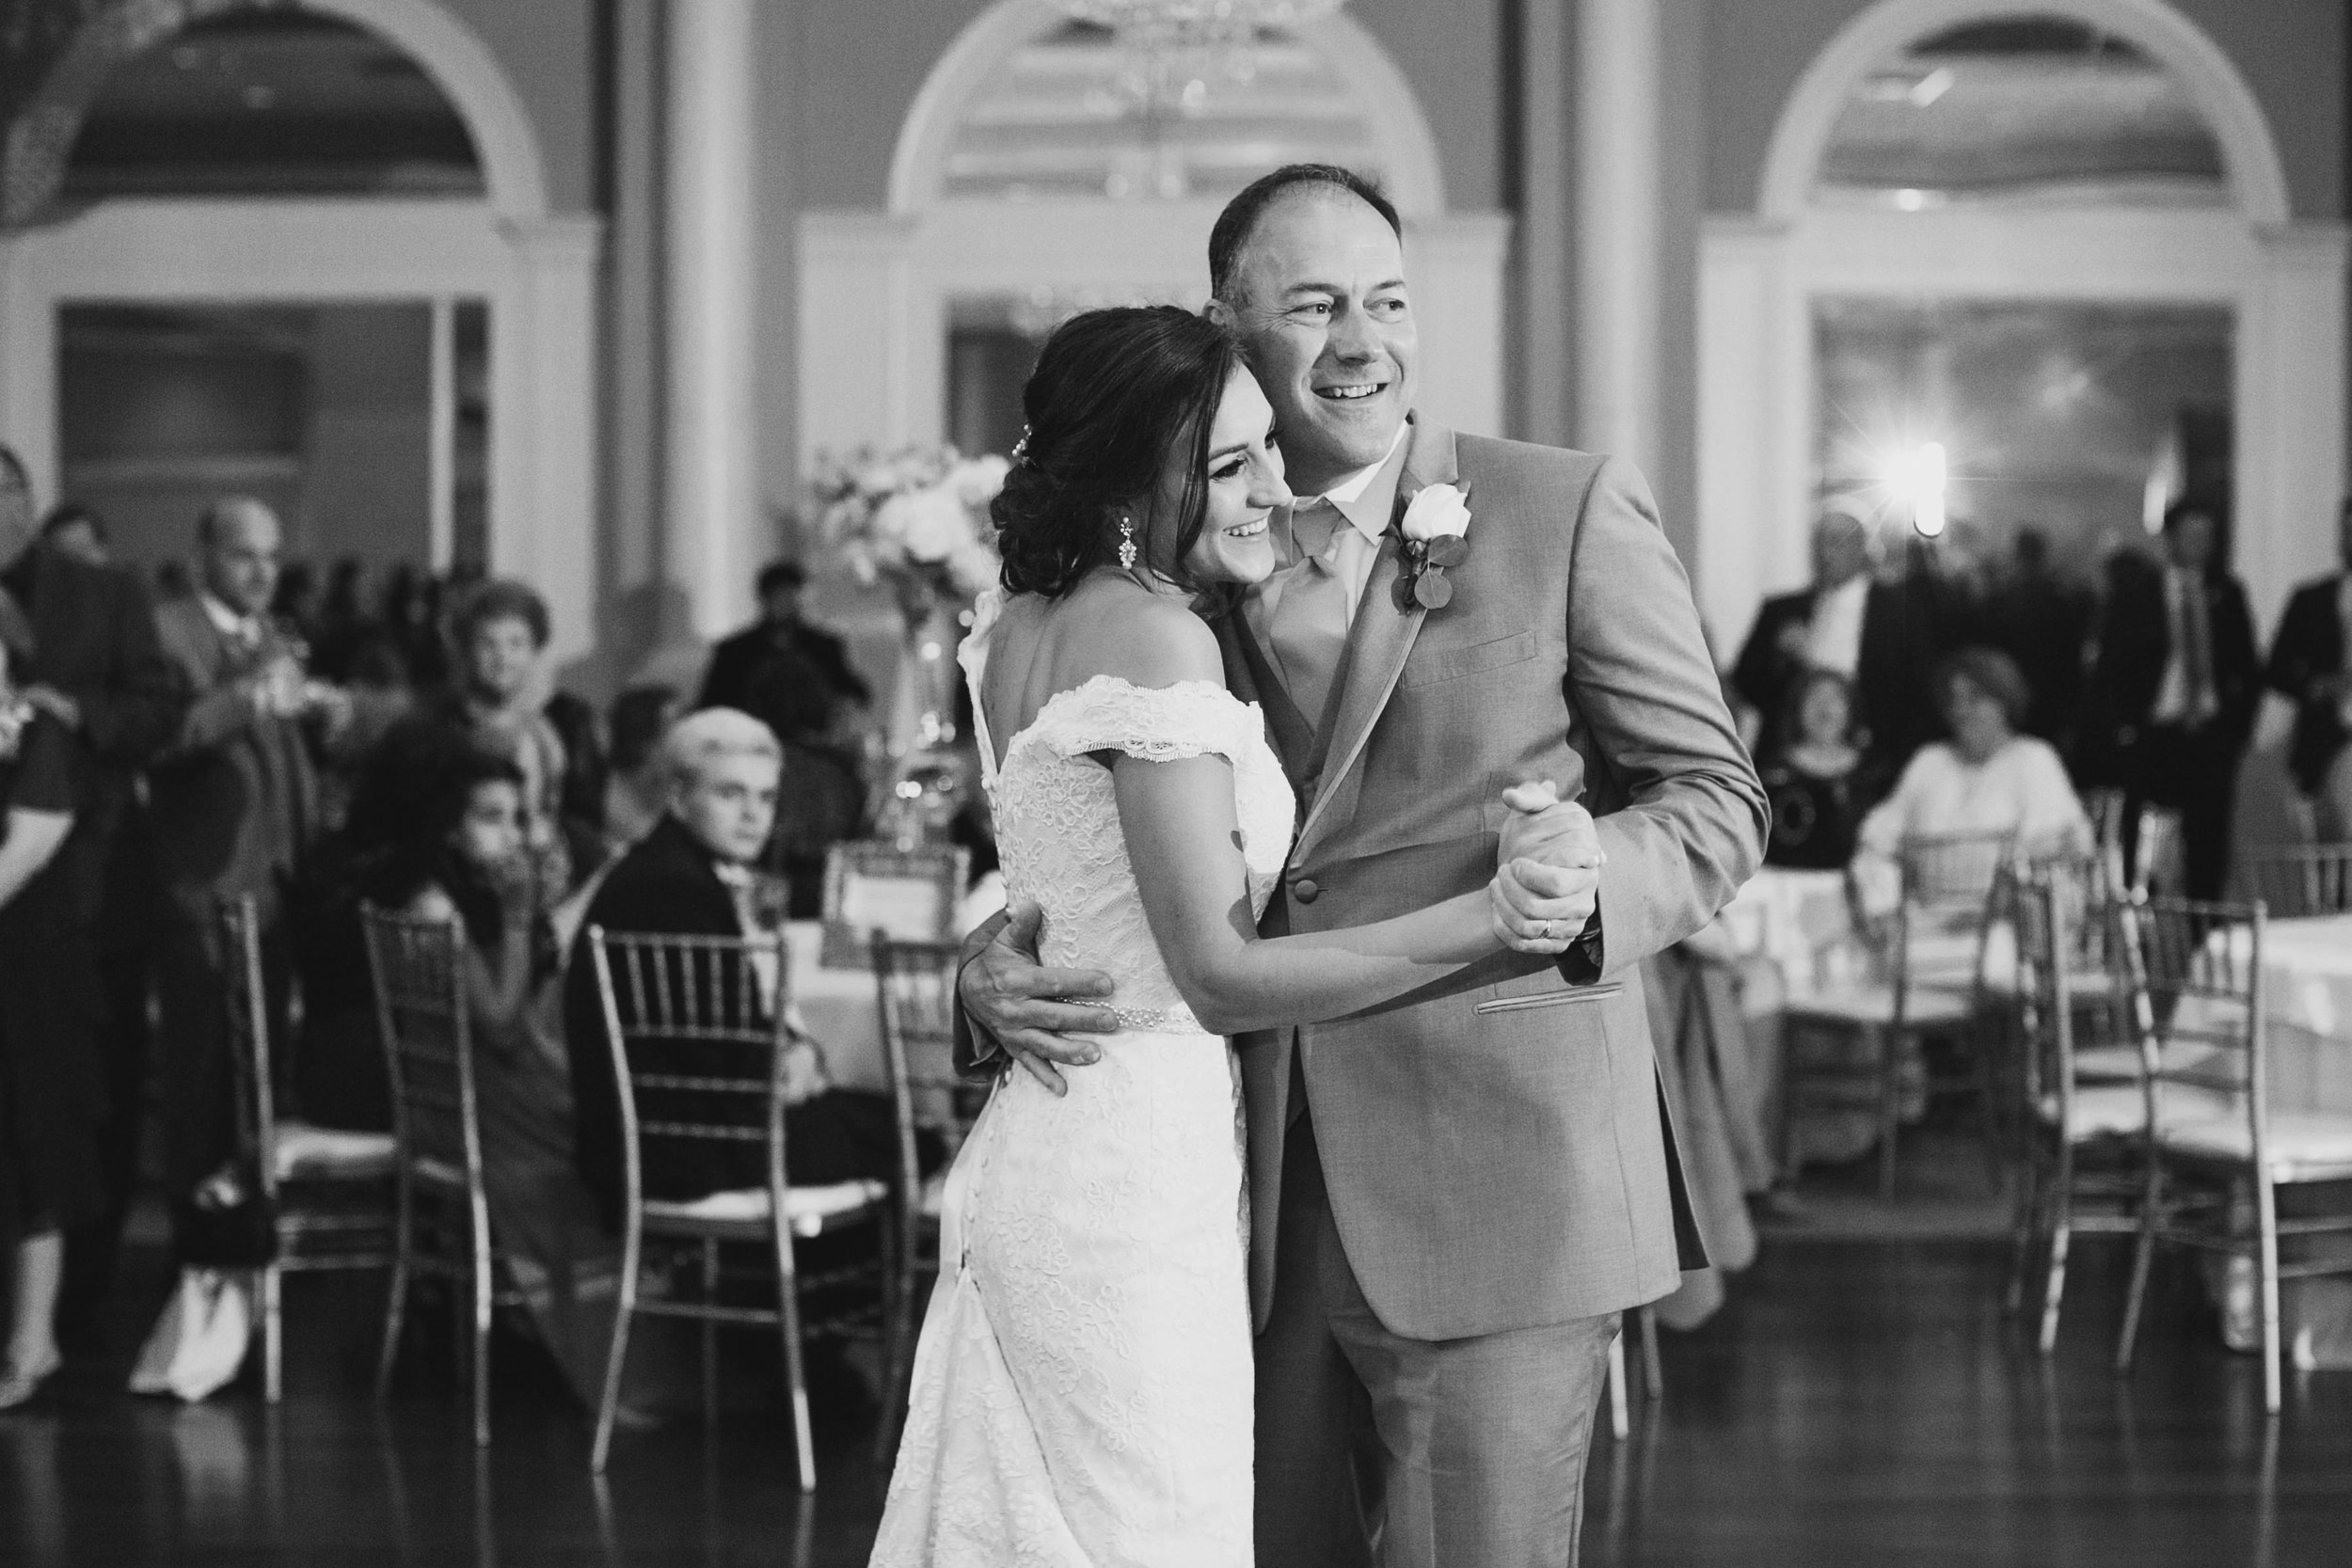 Citron_Bergeron_wedding-0849bw.jpg